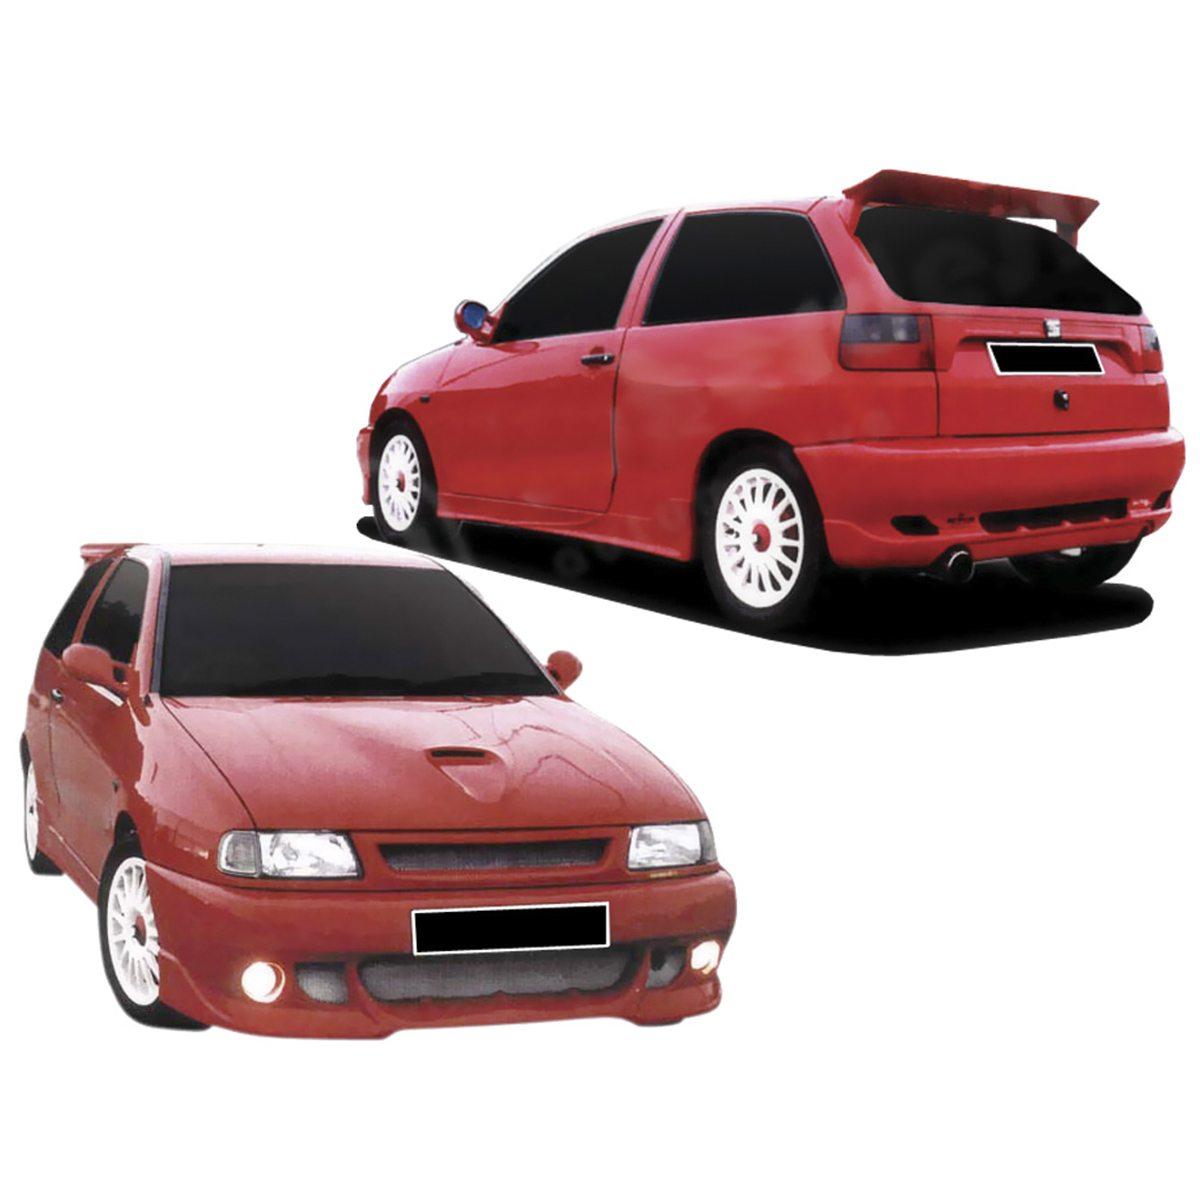 Seat-Ibiza-93-Tunner-KIT-QTU159